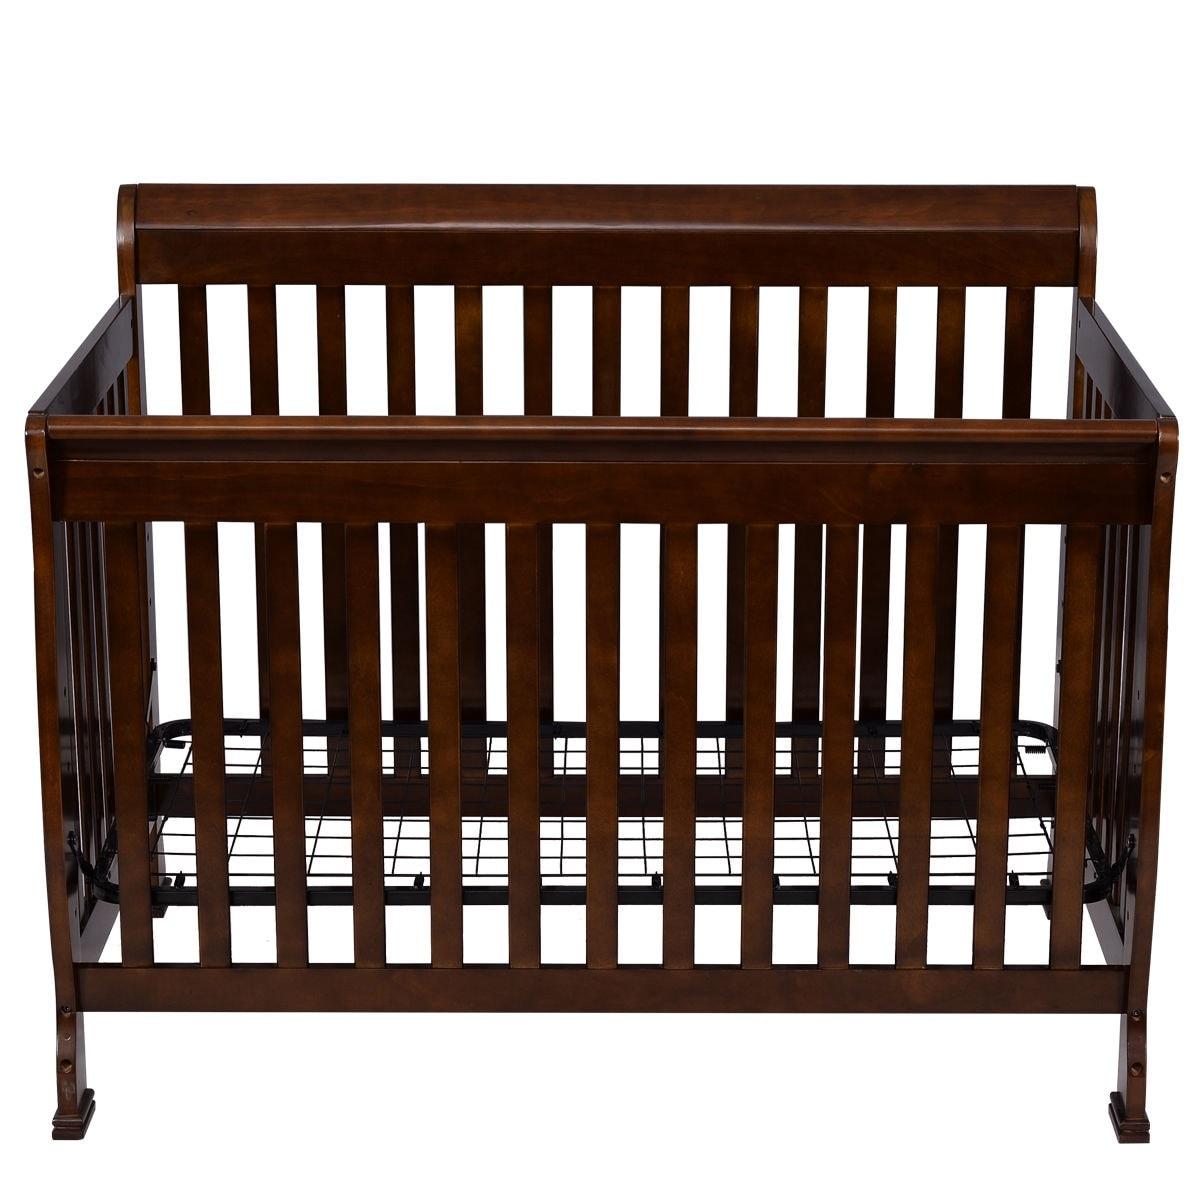 Coffee Pine Wood Baby Toddler Bed Convertible Crib Nursery Furniture Children